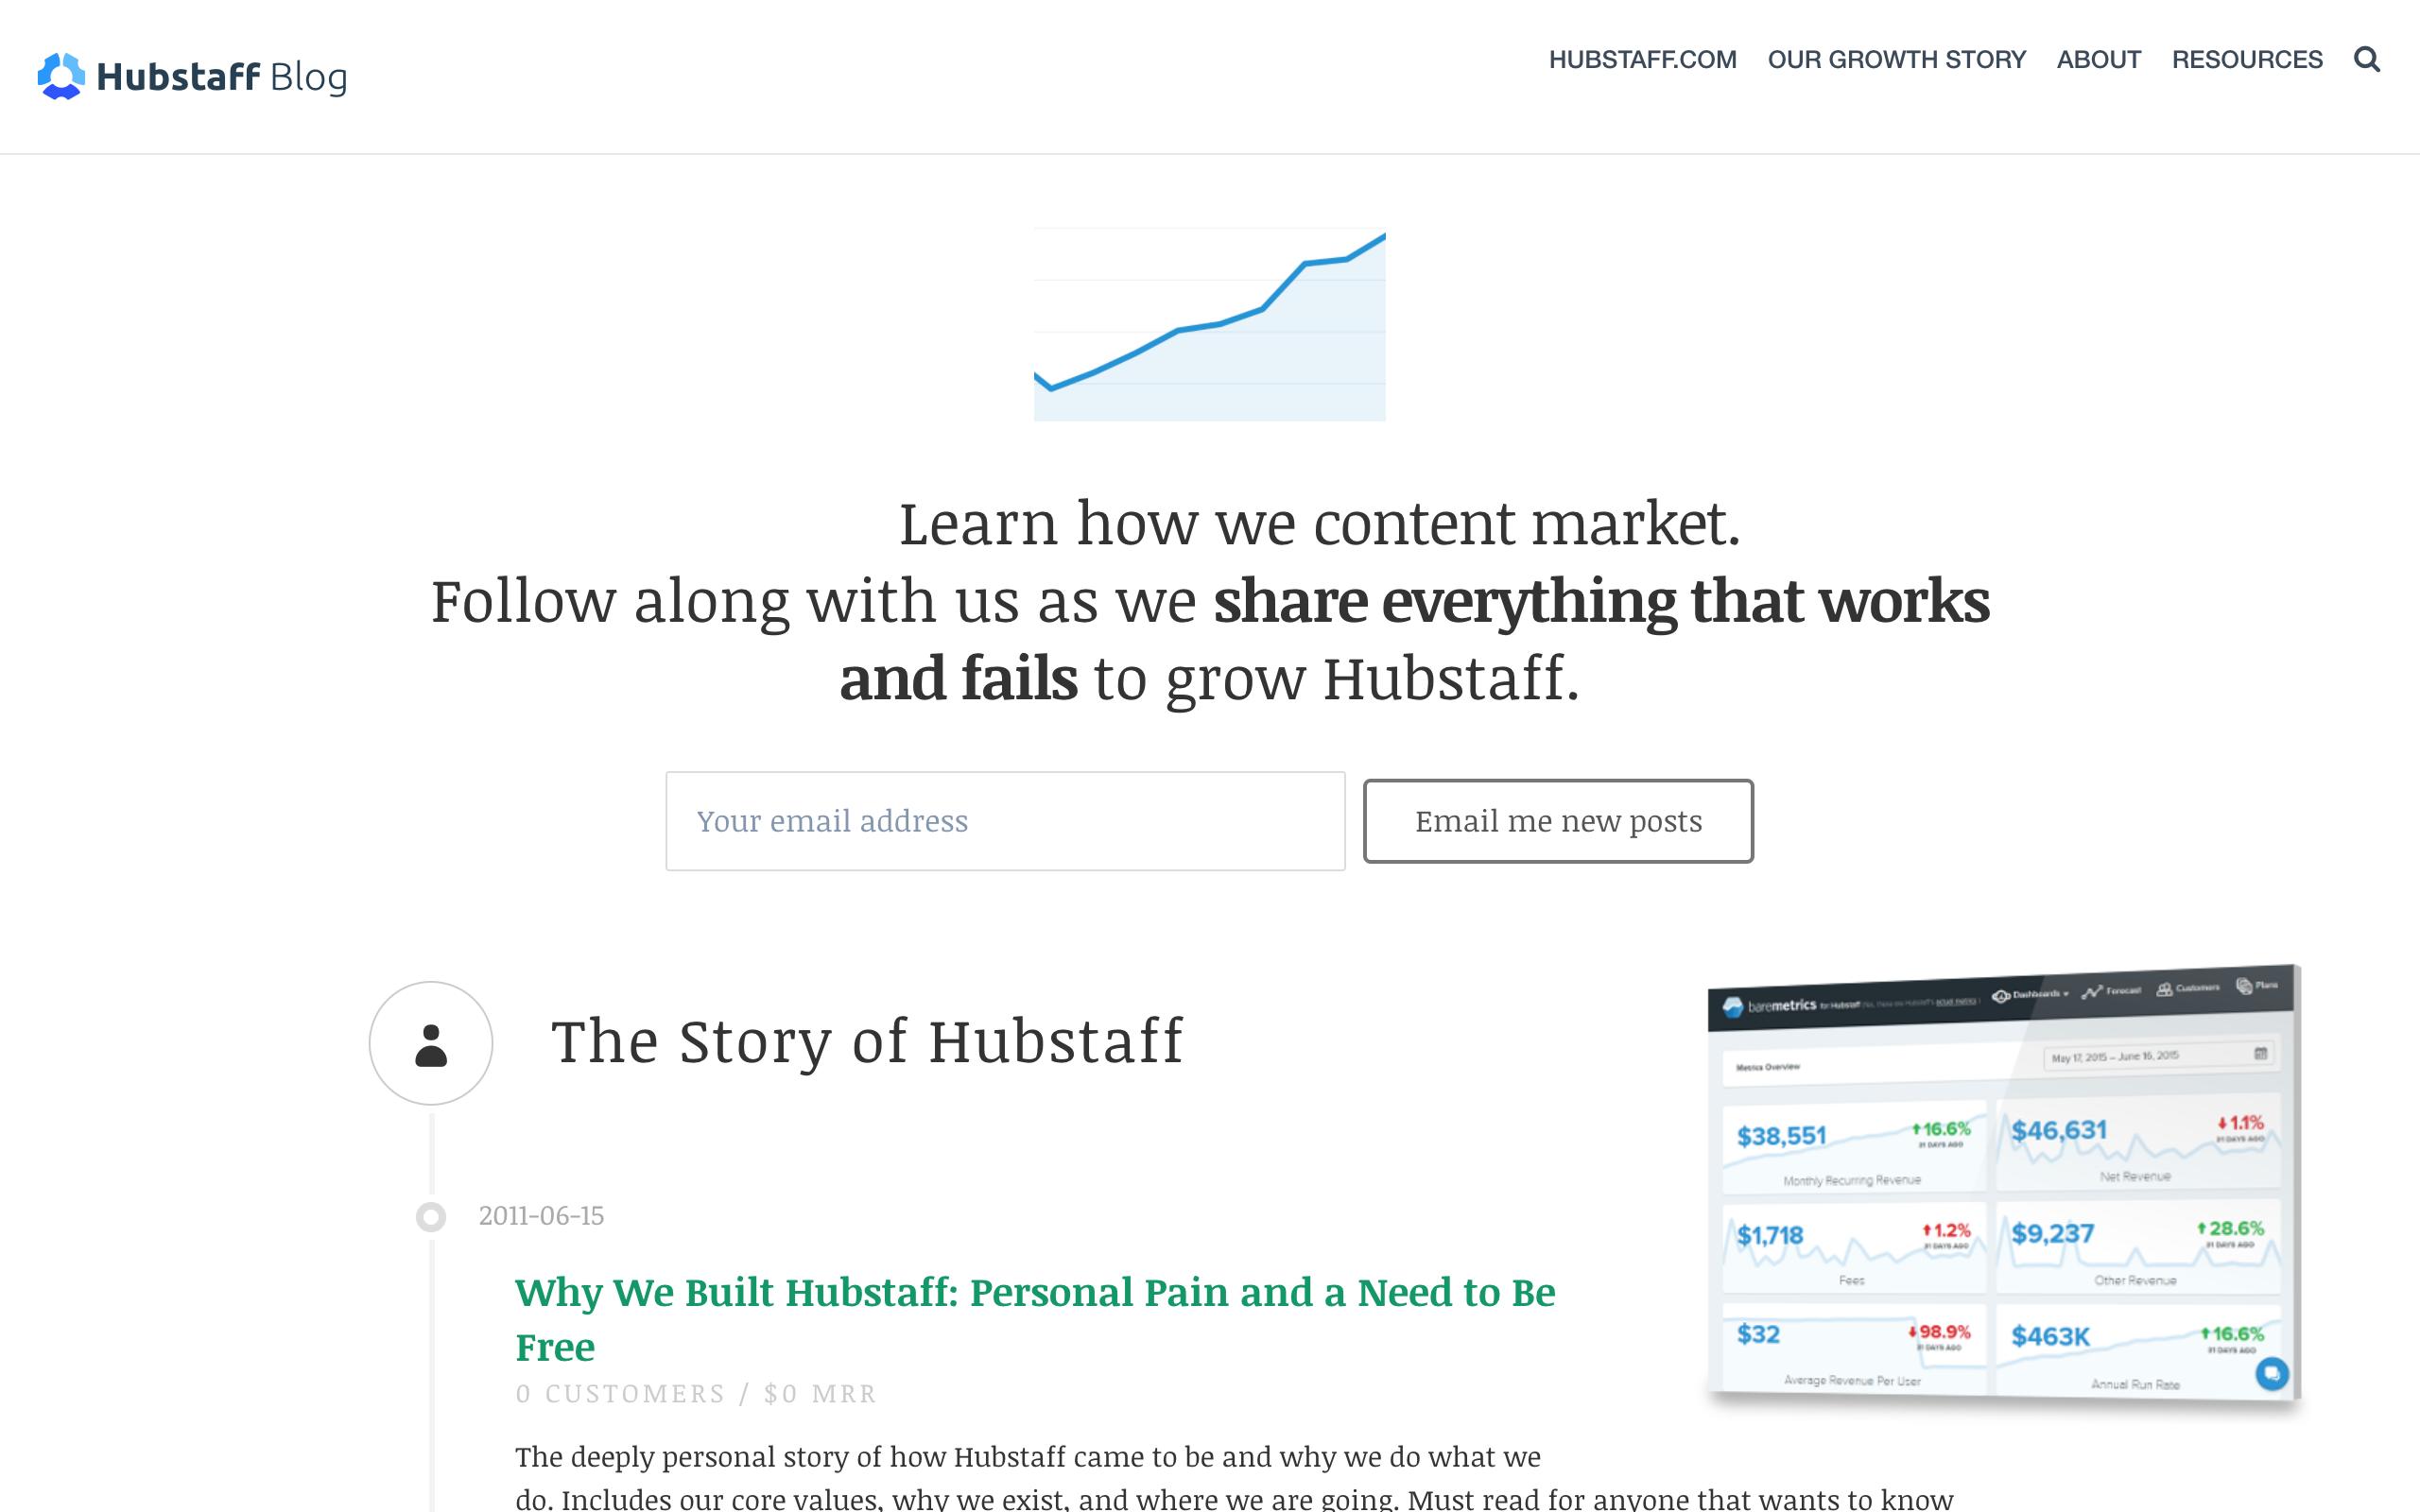 Hubstaff blog